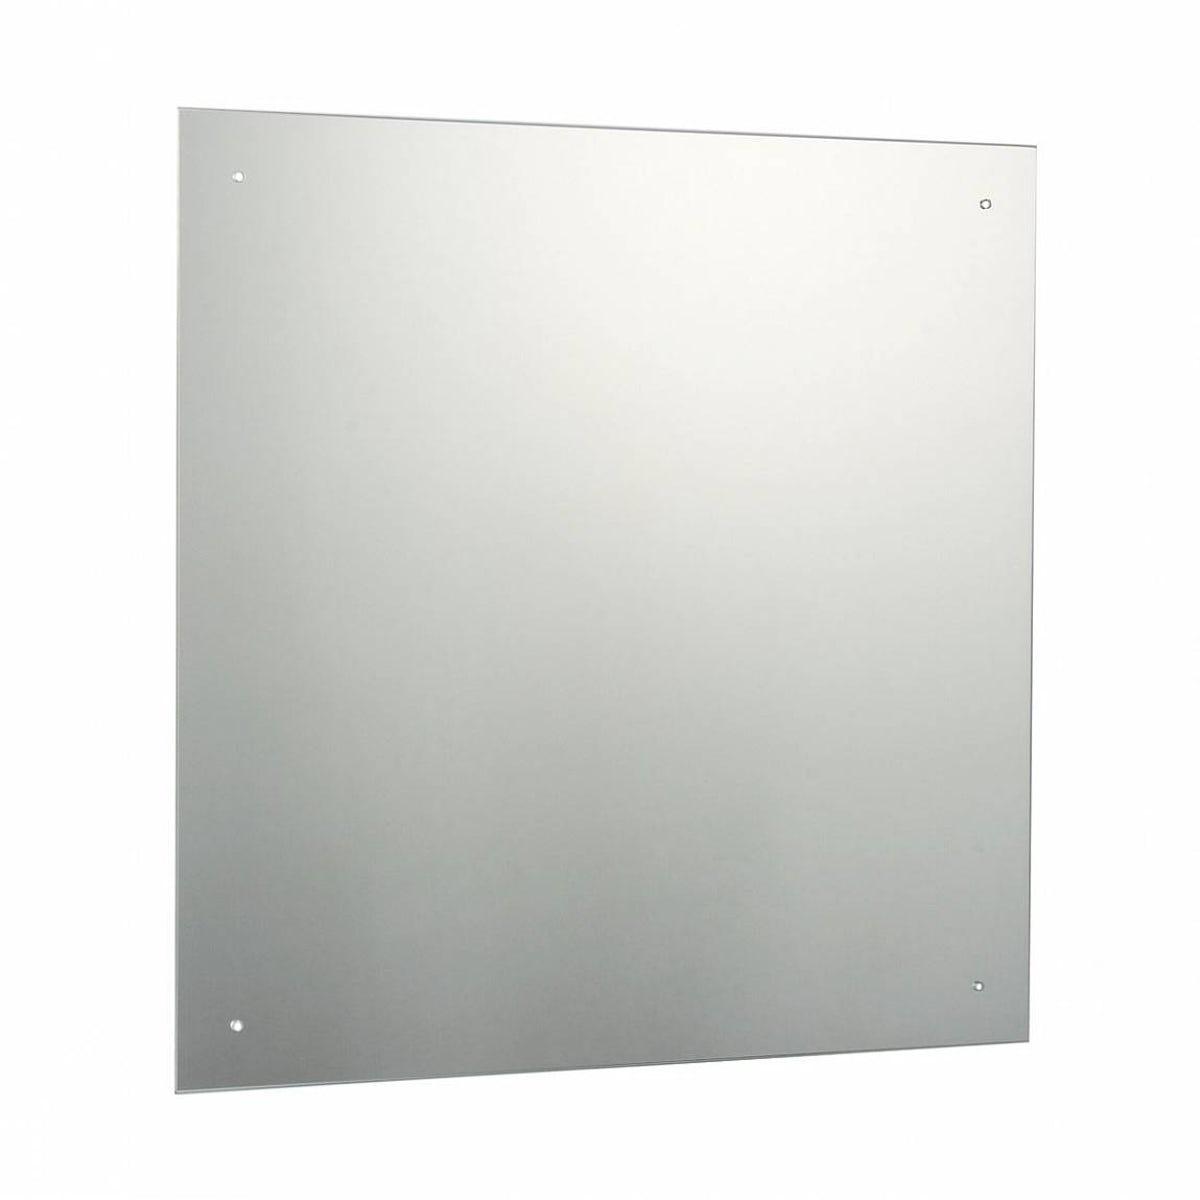 Bevelled Bathroom Mirror Square Bevelled Edge Drilled Mirror 60x60cm Victoriaplumcom